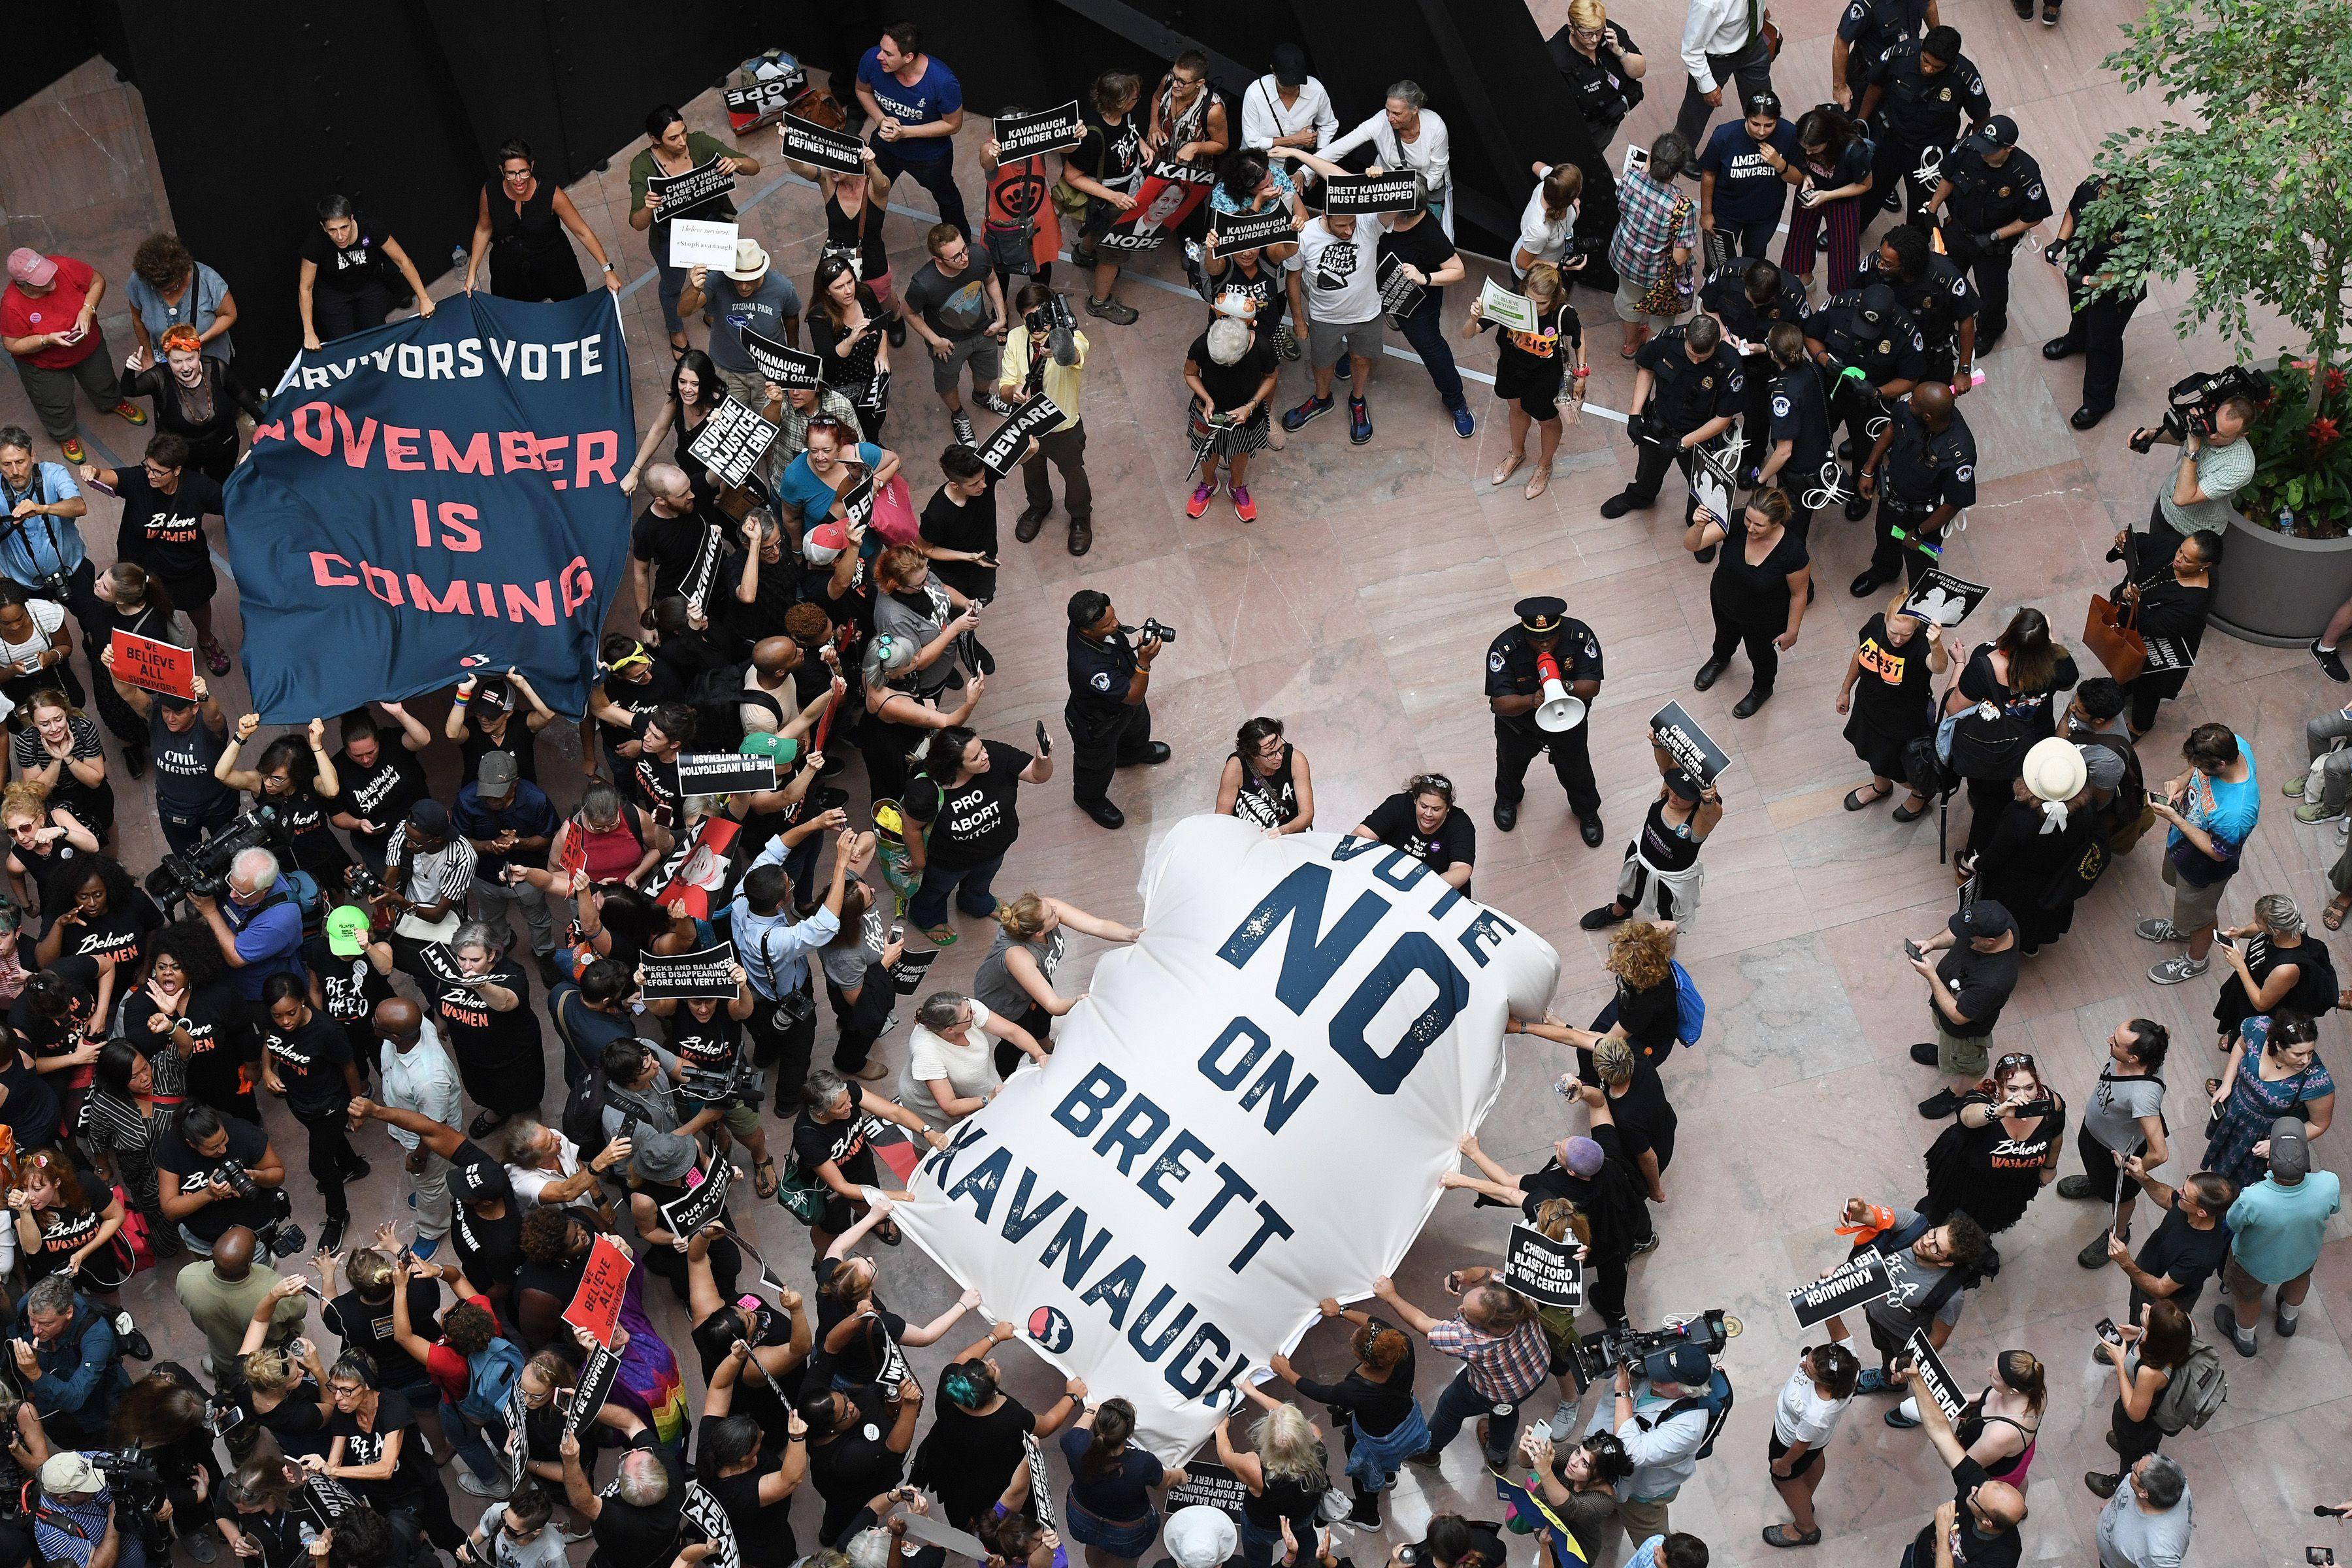 Rally Opposing Brett Kavanaugh - Washinton, DC